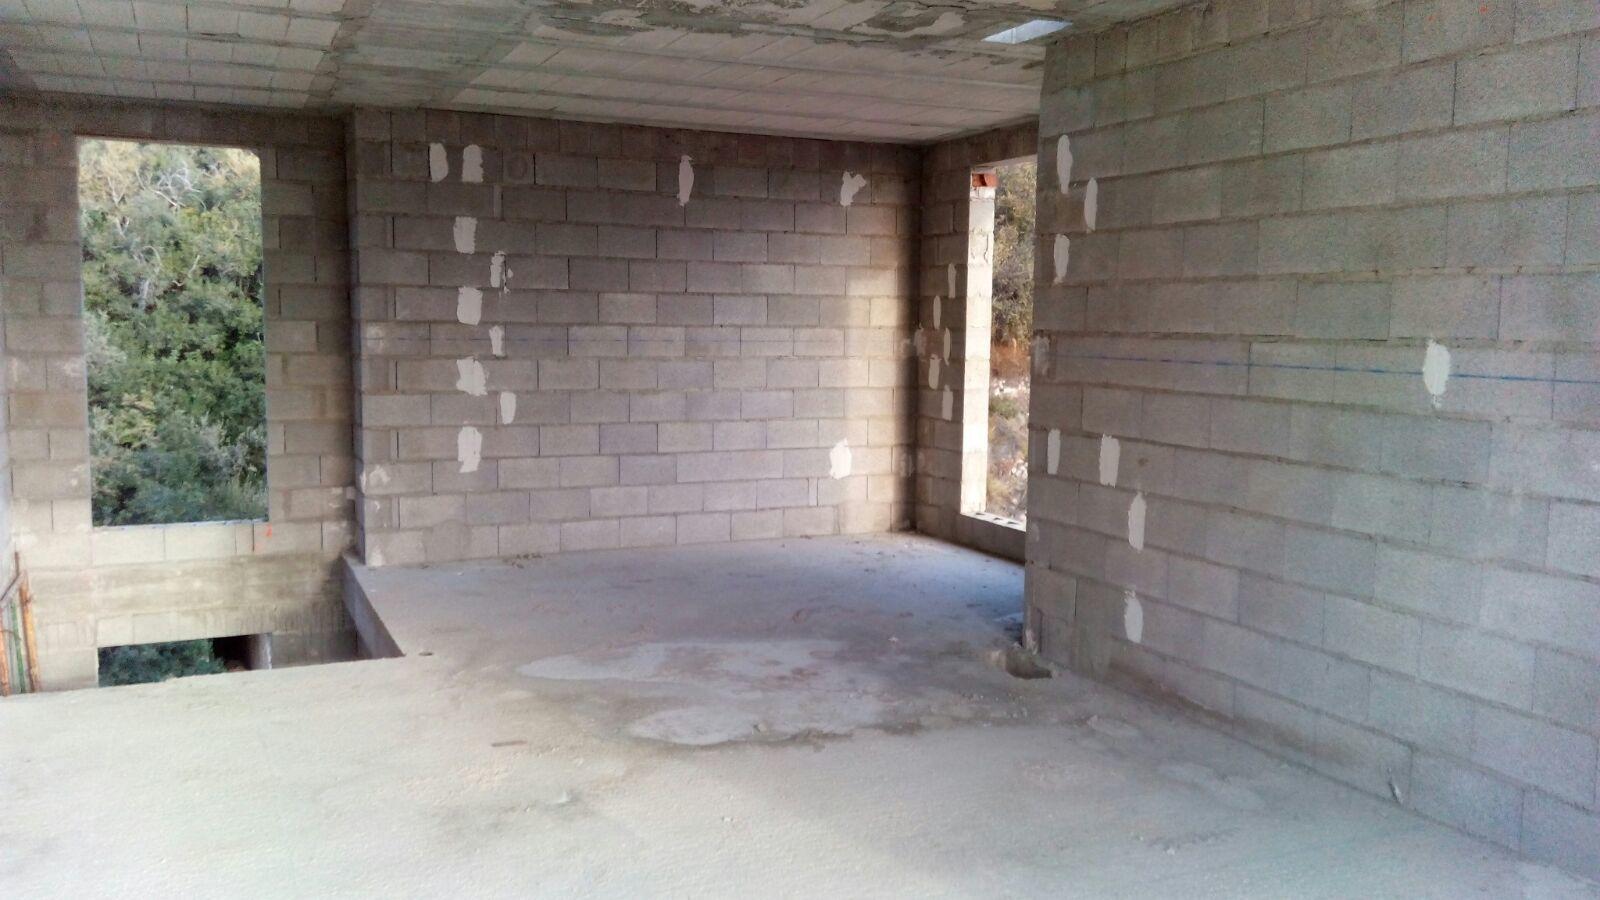 Foto 25 de Aislamientos acústicos y térmicos en Rafelcofer | Aislamientos de Poliuretano Jaime Femenia